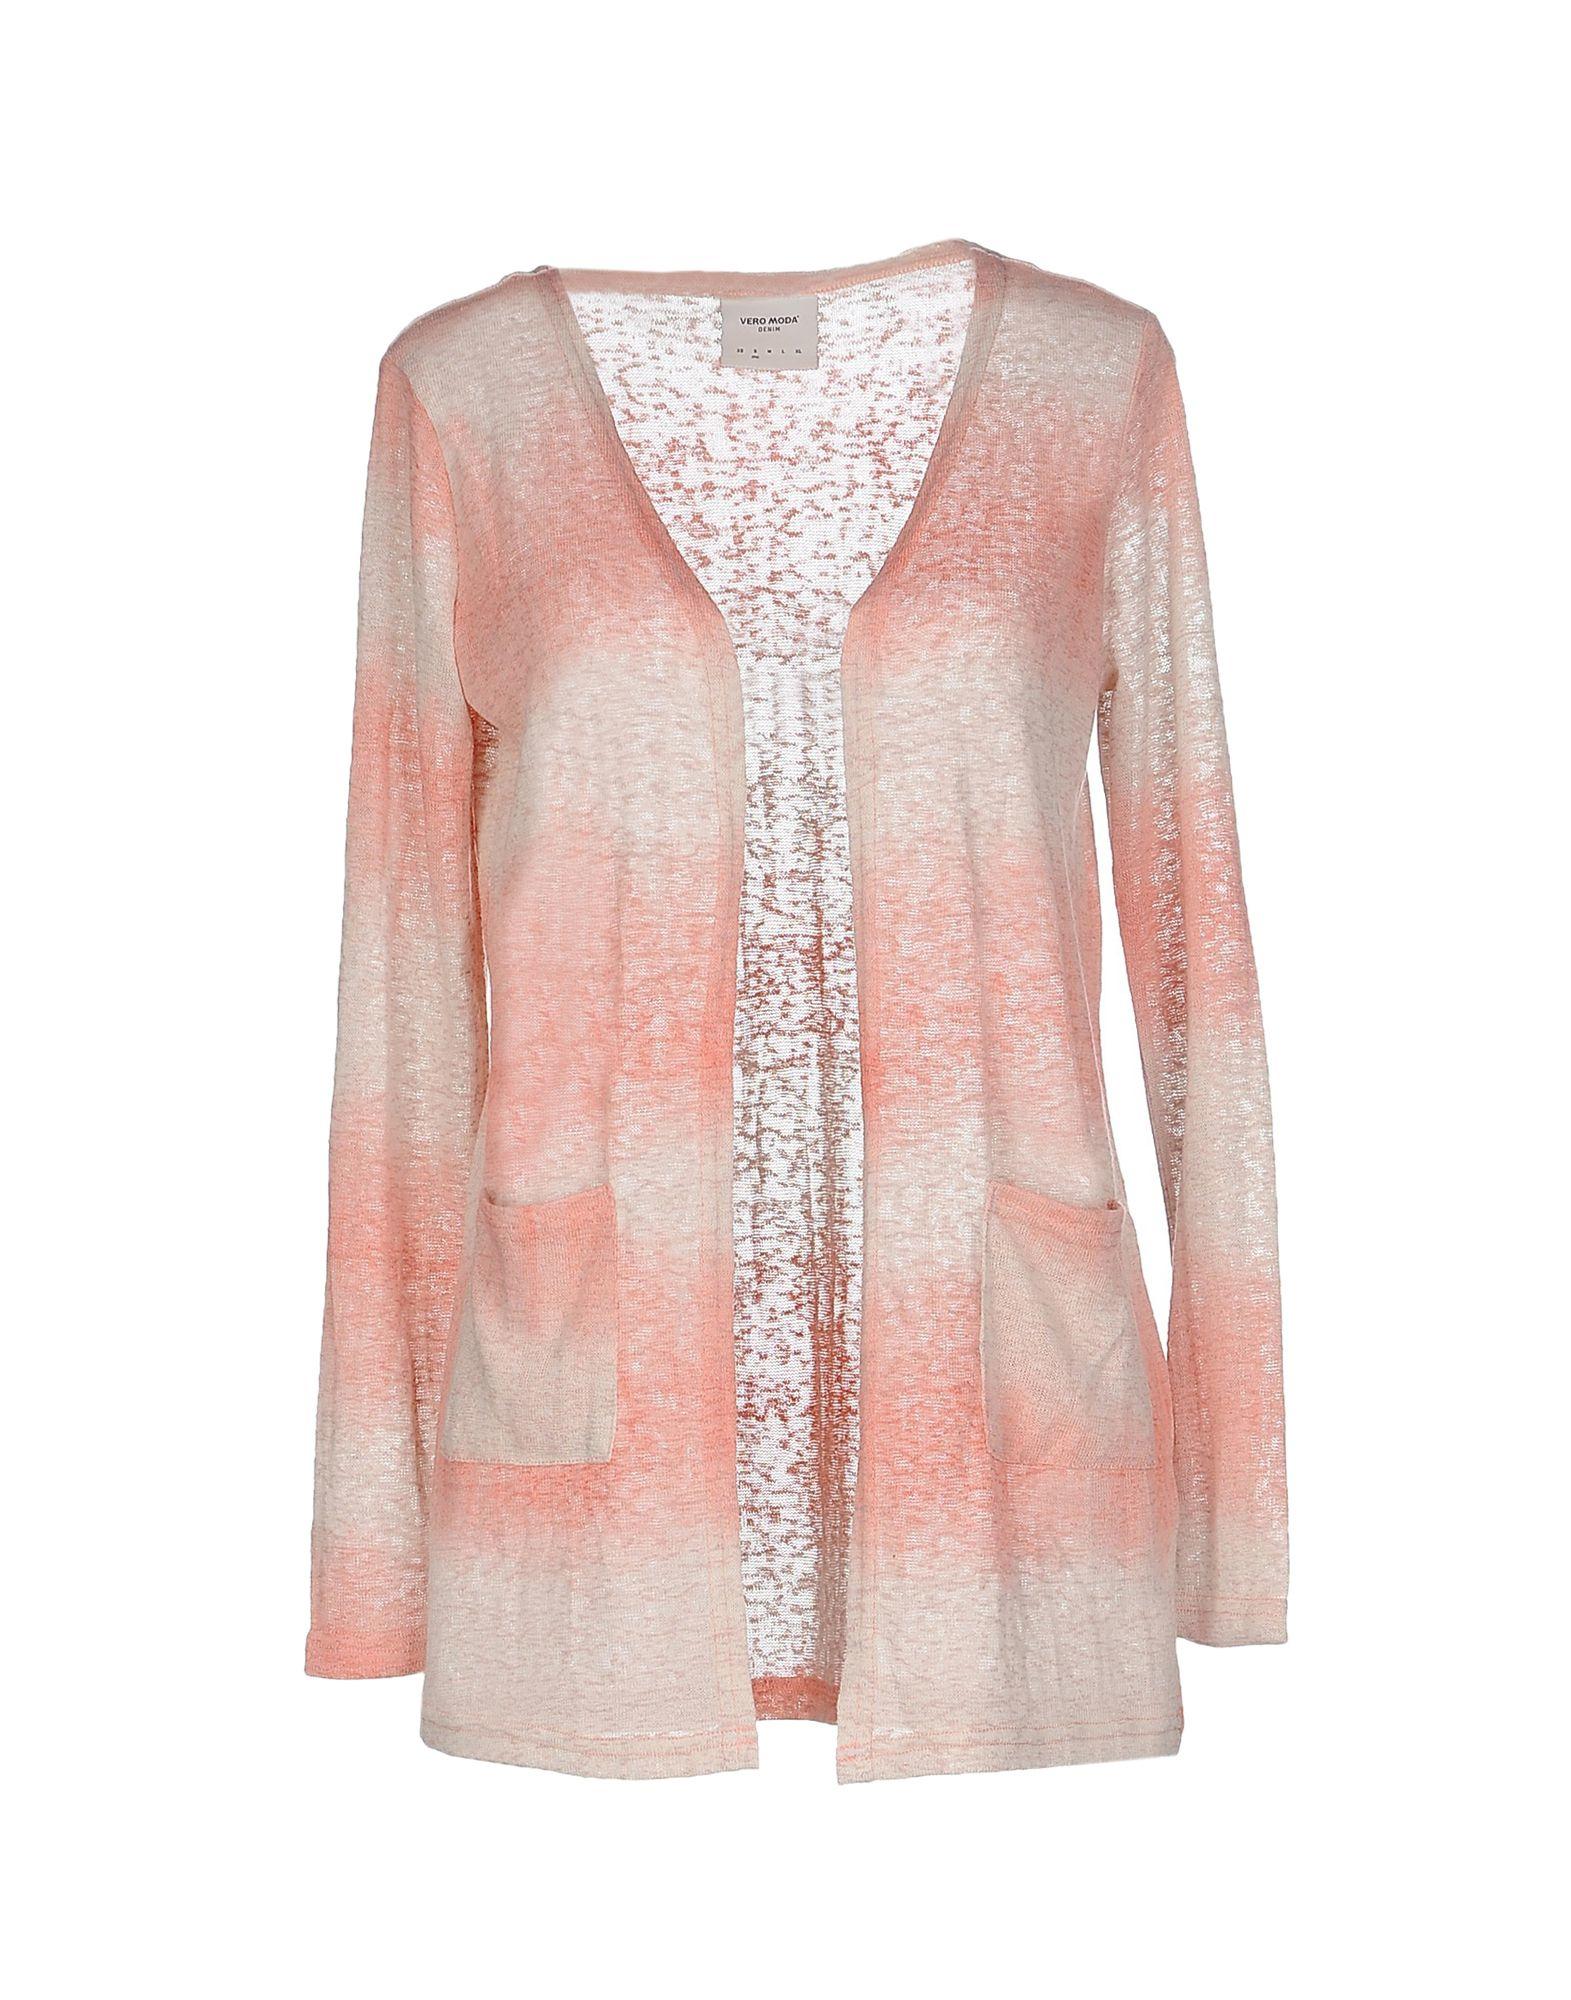 Vero Moda Knitting Patterns : Vero moda cardigan in pink save lyst